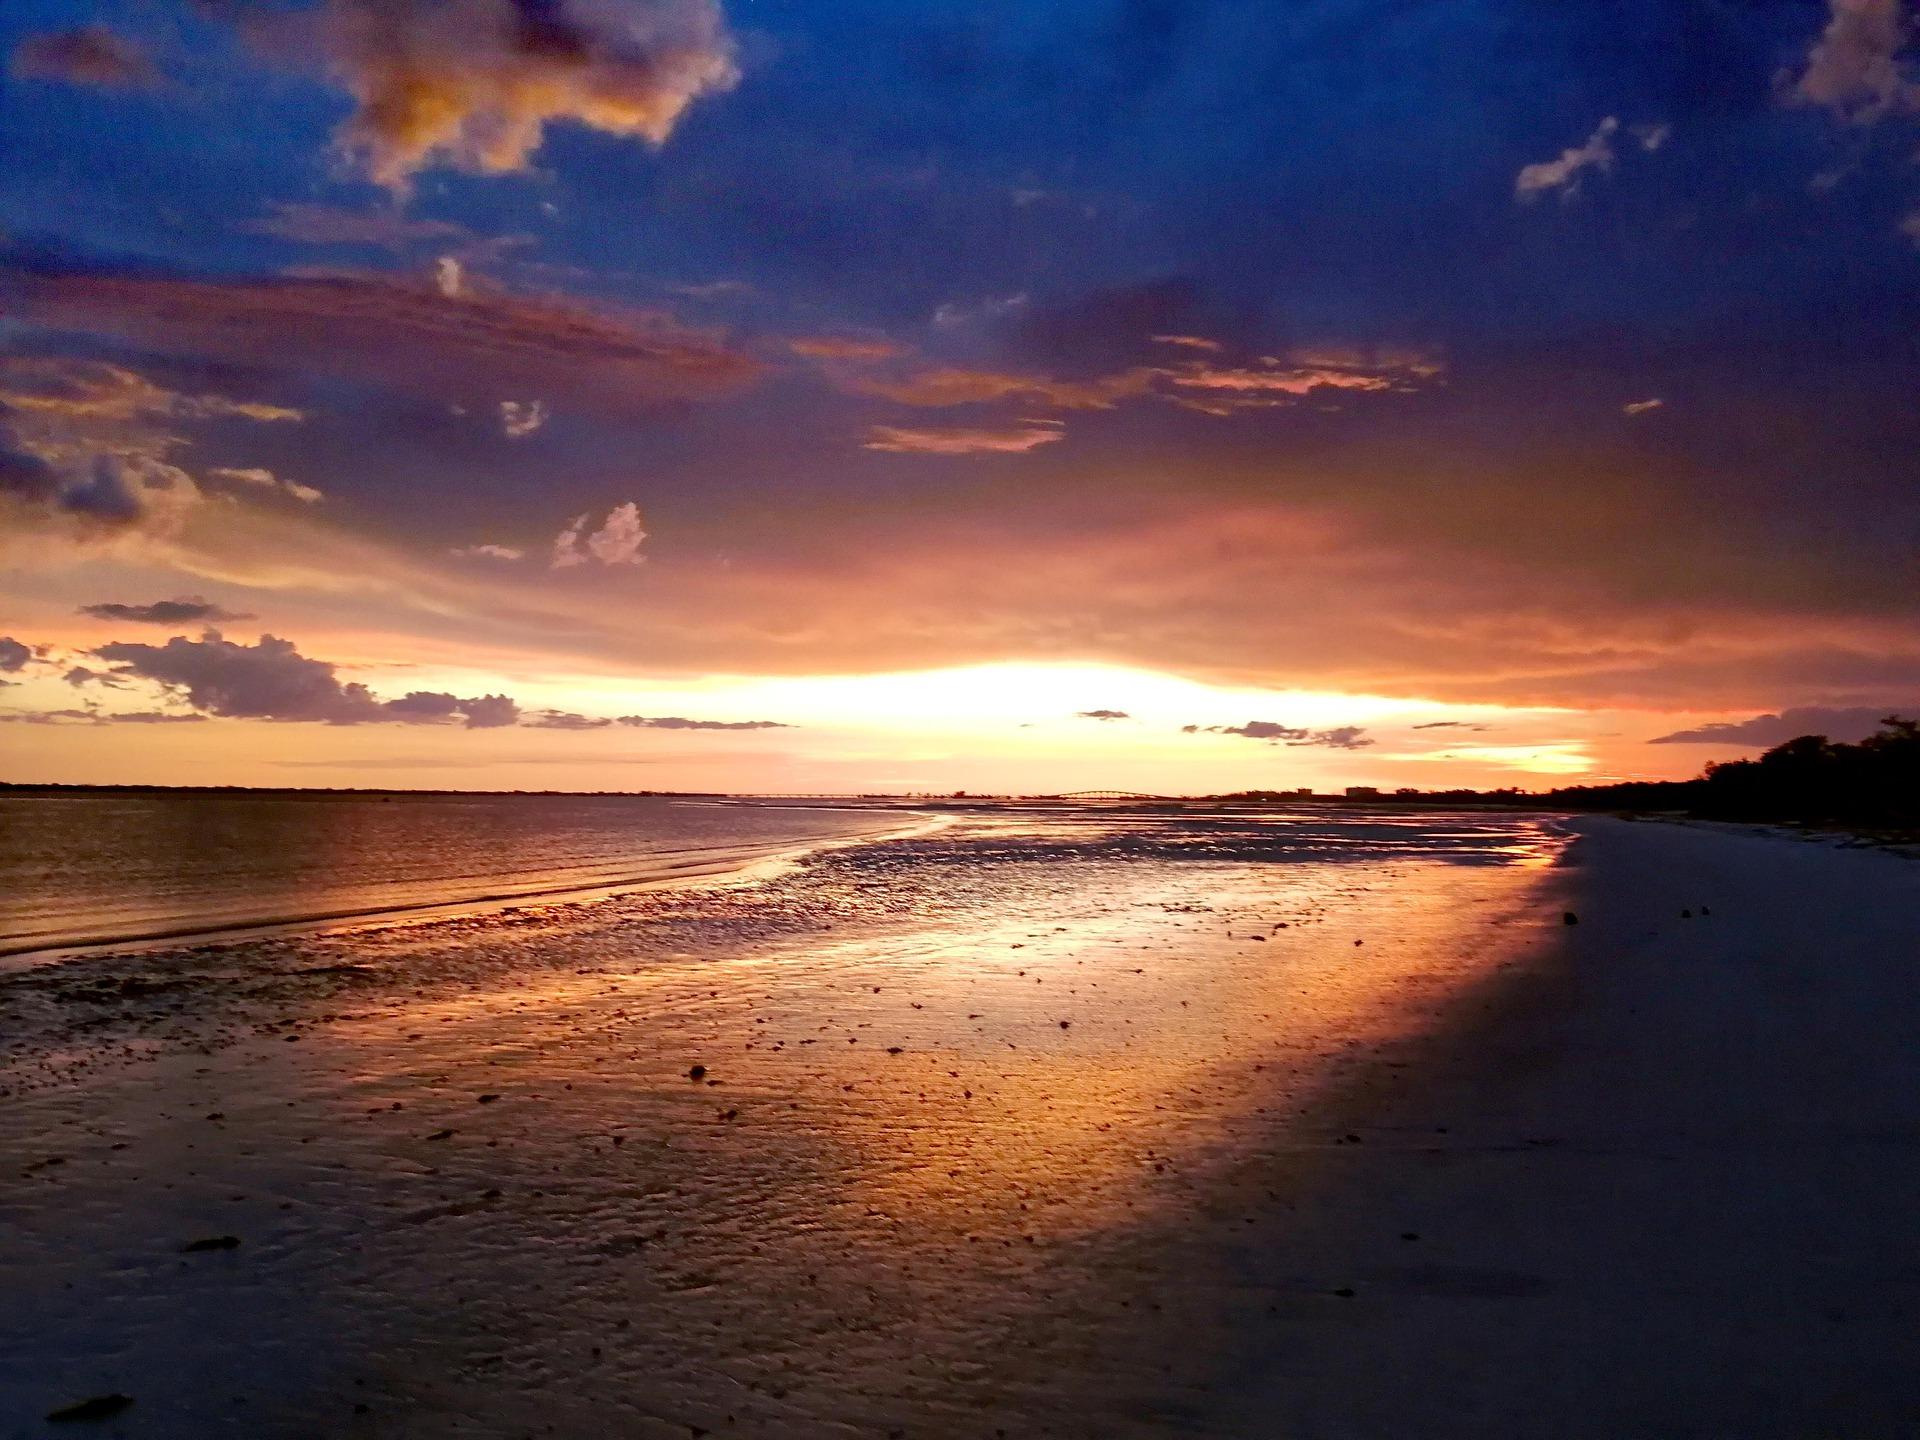 sunset-4996711_1920